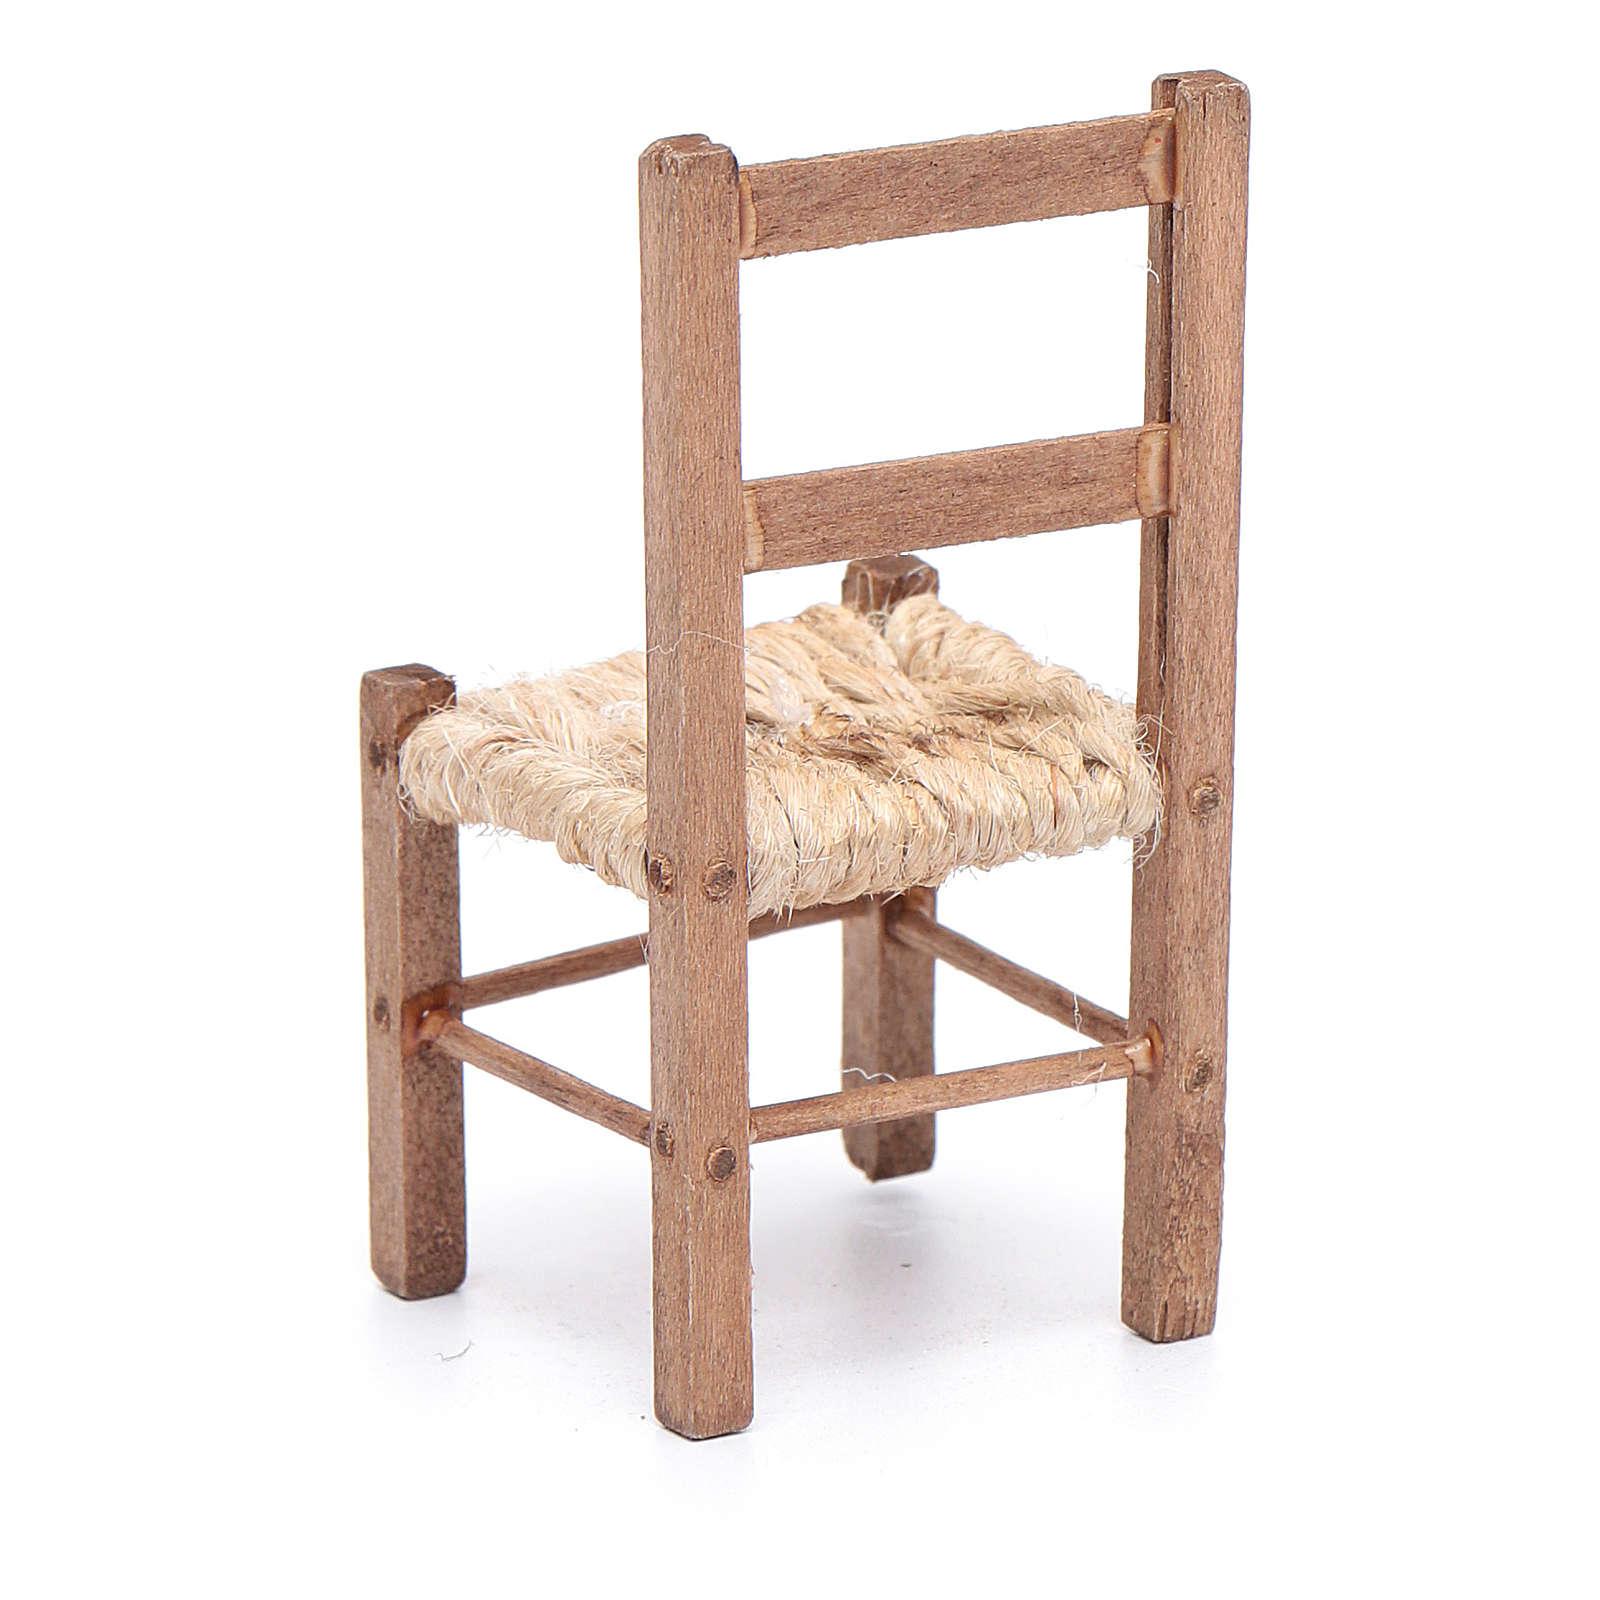 DIY wooden chiar and rope 7 cm for Neapolitan nativity scene 4